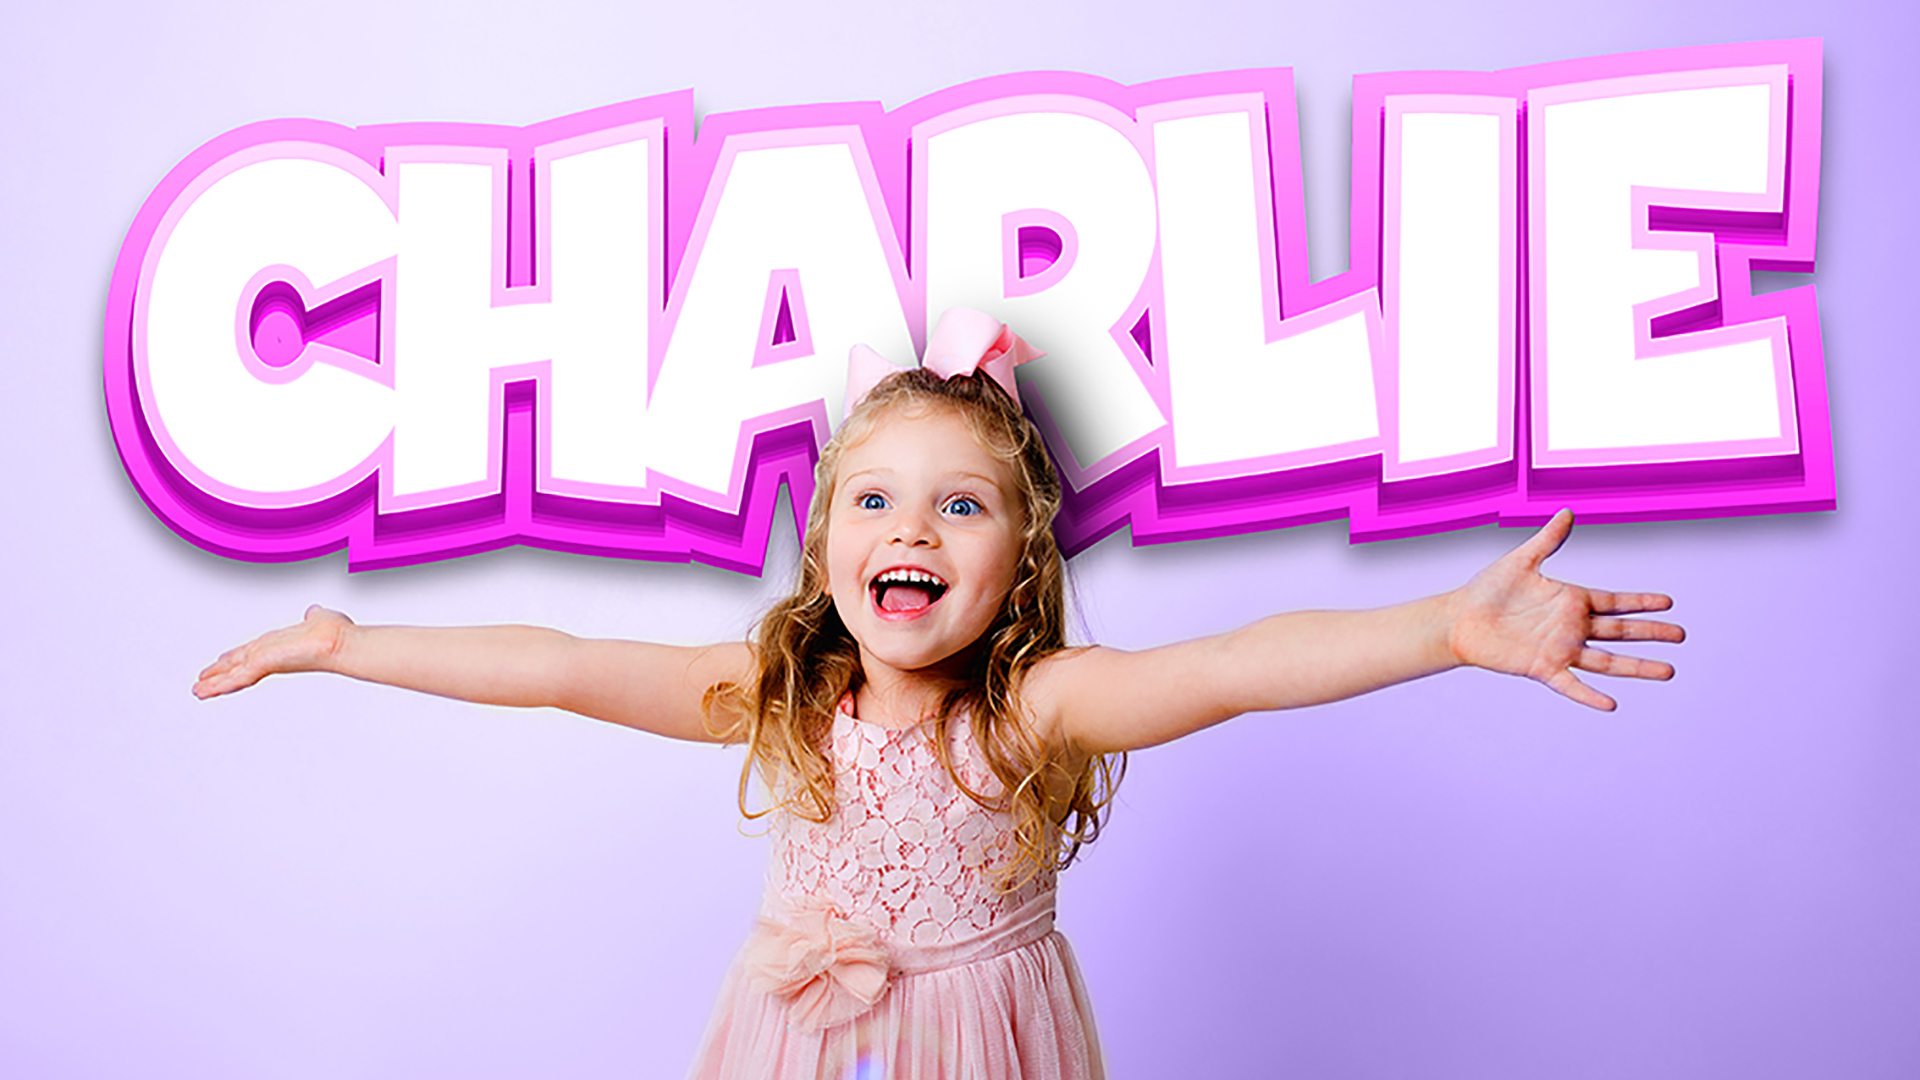 Charlie - Season 2